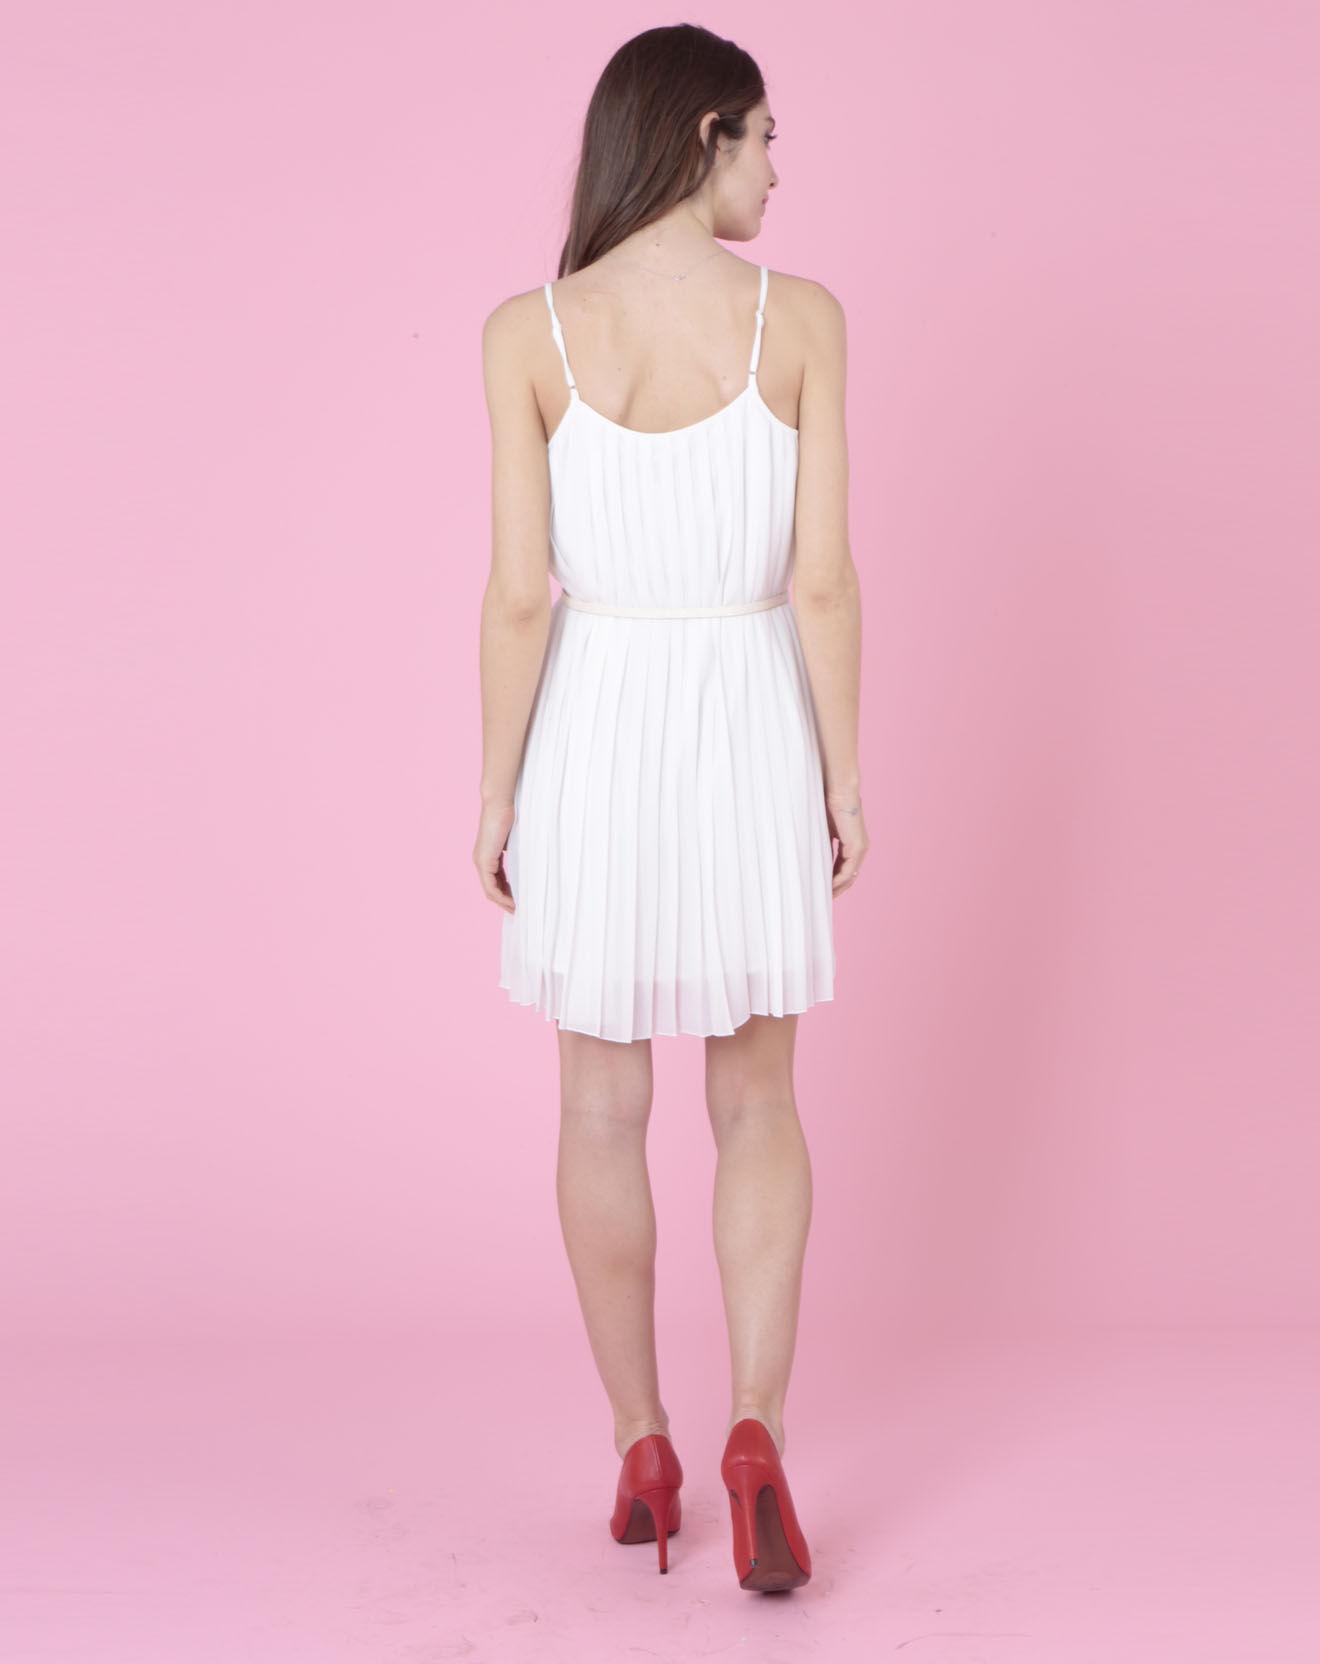 Best-Mountain-Femme-Robe-fines-bretelles-et-ceinture-ecrue